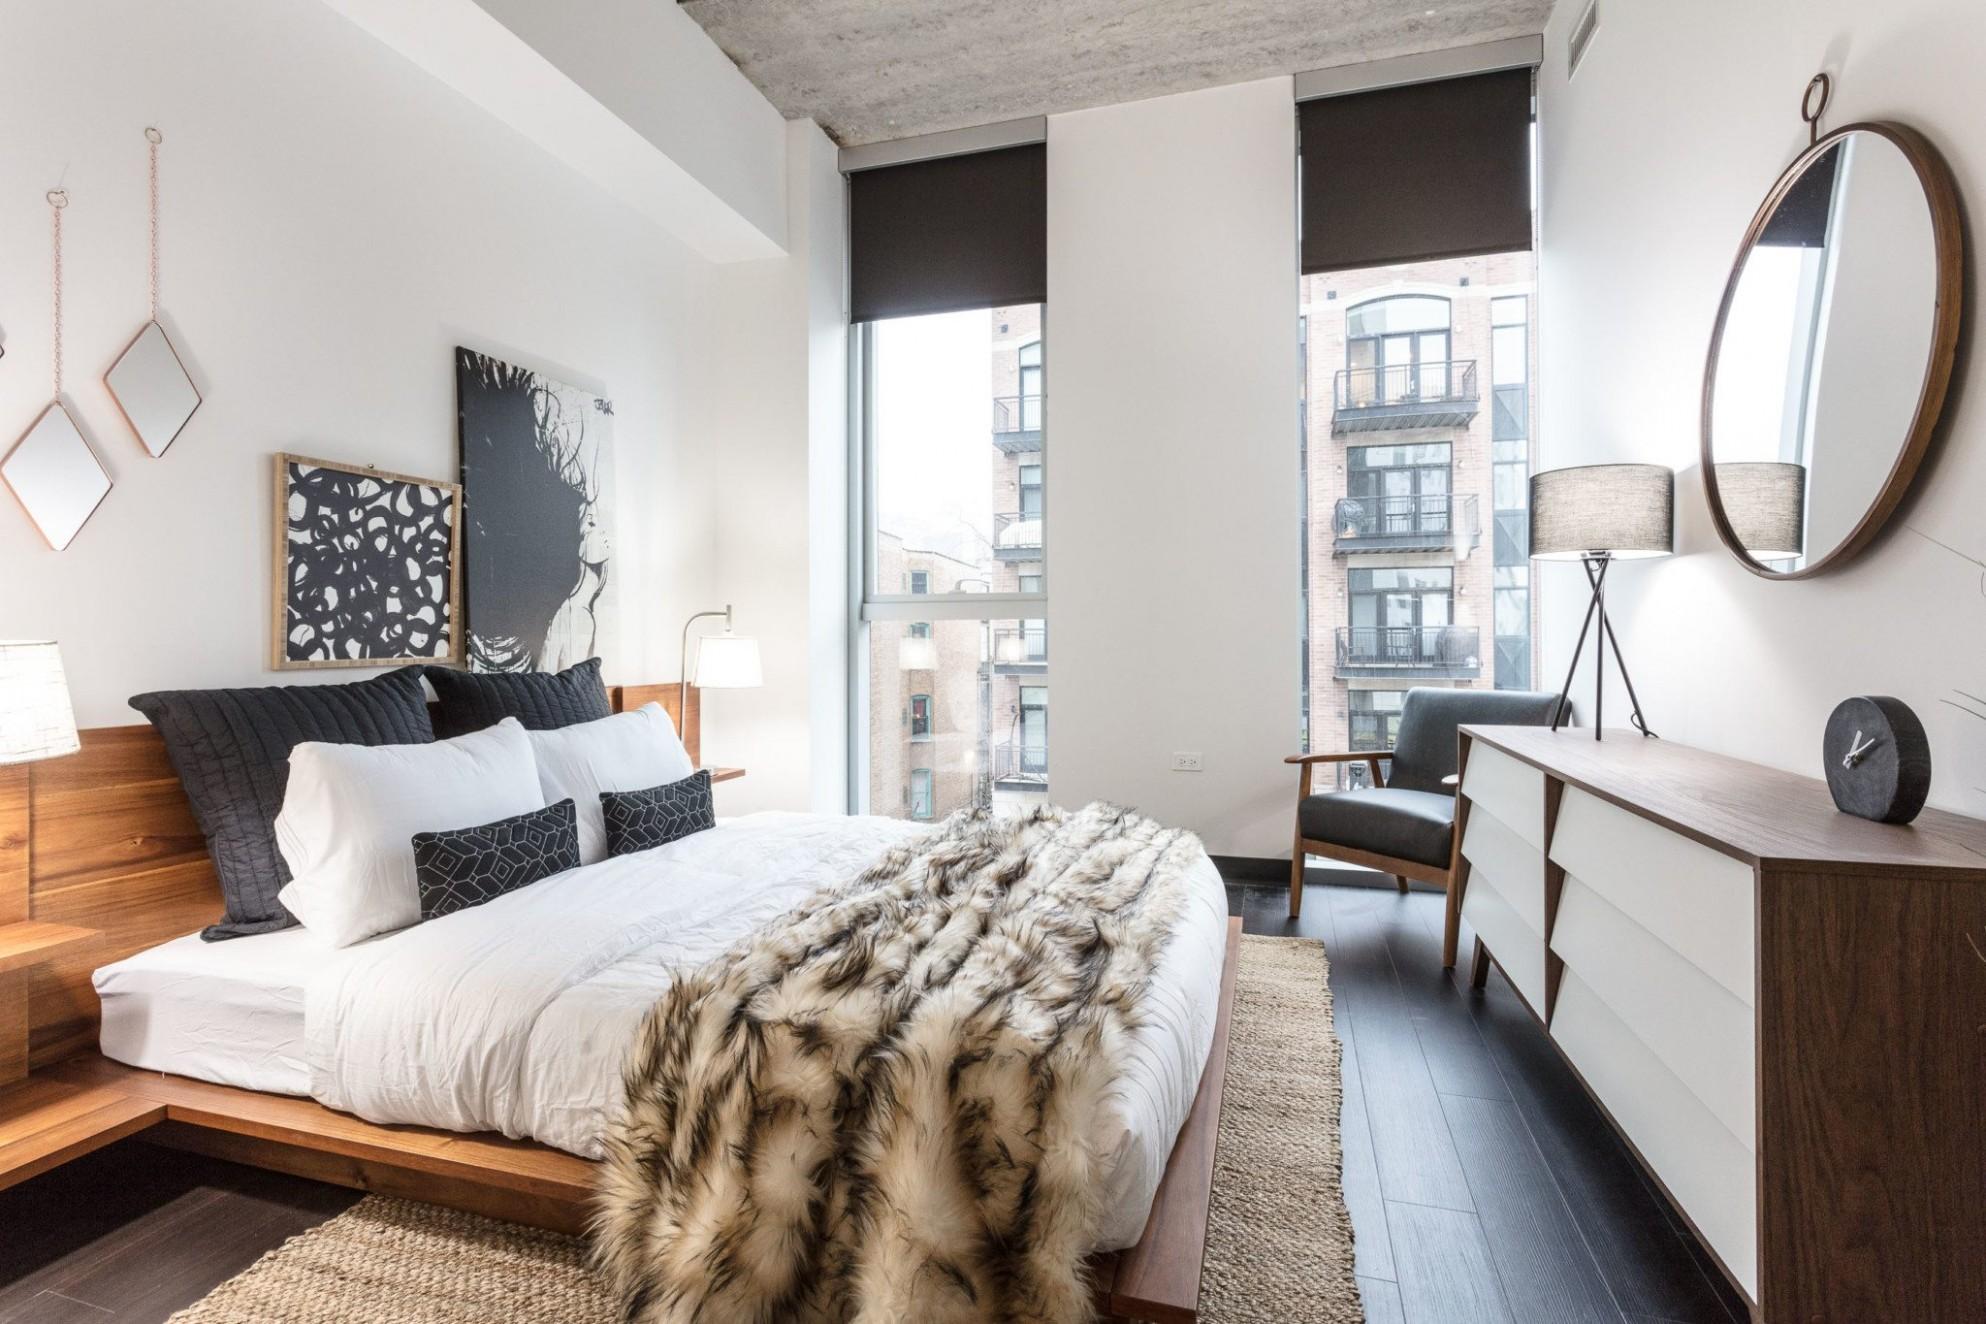 11 Apartment Bedroom Decorating Ideas - Luxury Living - Bedroom Ideas Apartment